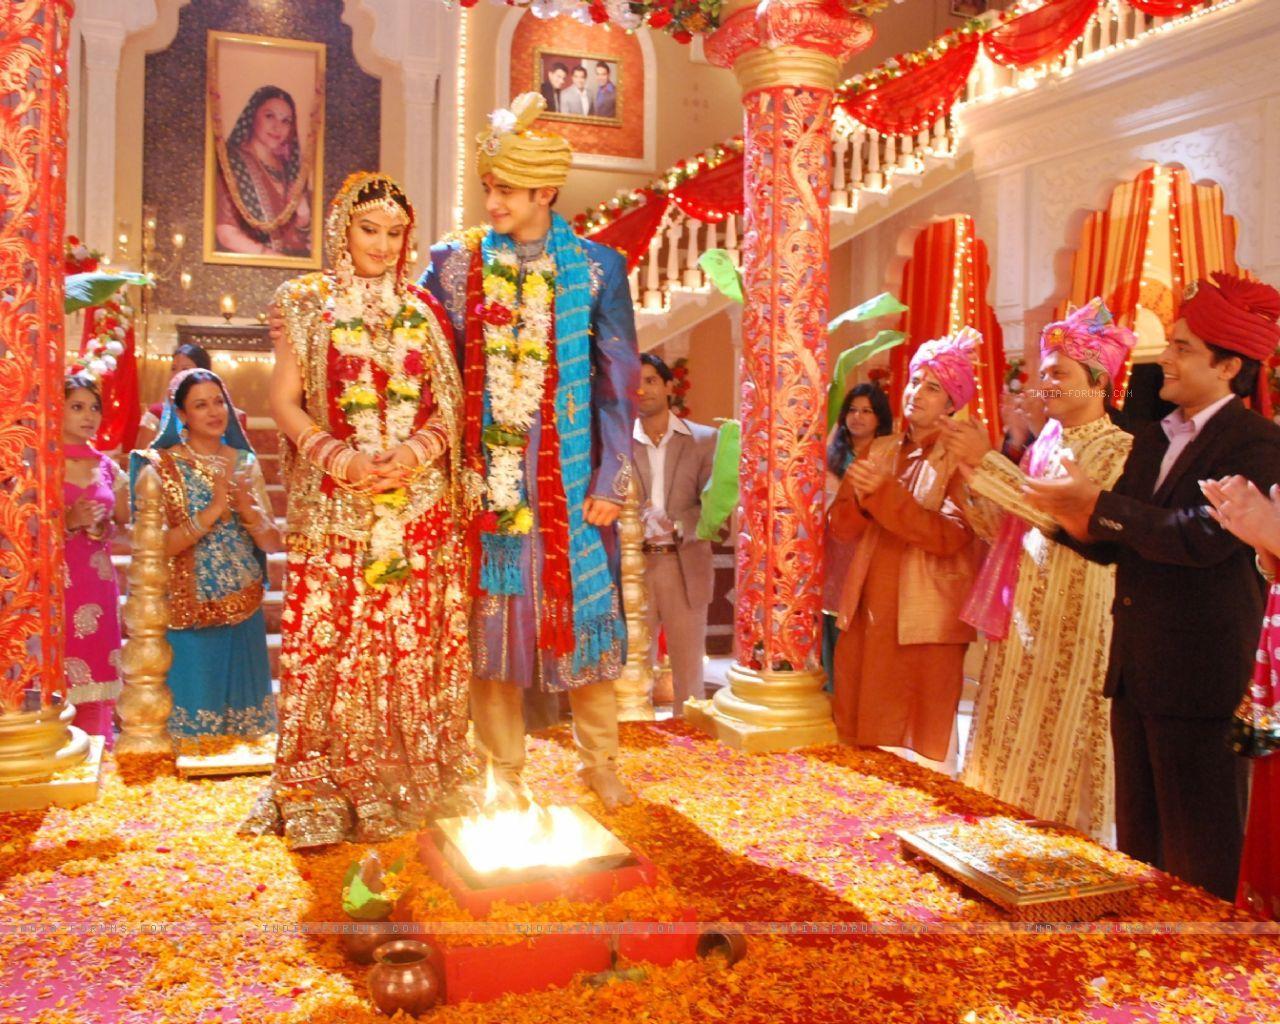 indian wedding hindu invitations%0A   Wedding Card India Wedding Cards    islamic wedding cards indian wedding  cards wedding     moved wedding cards indian wedding cards jaipur india  hindu